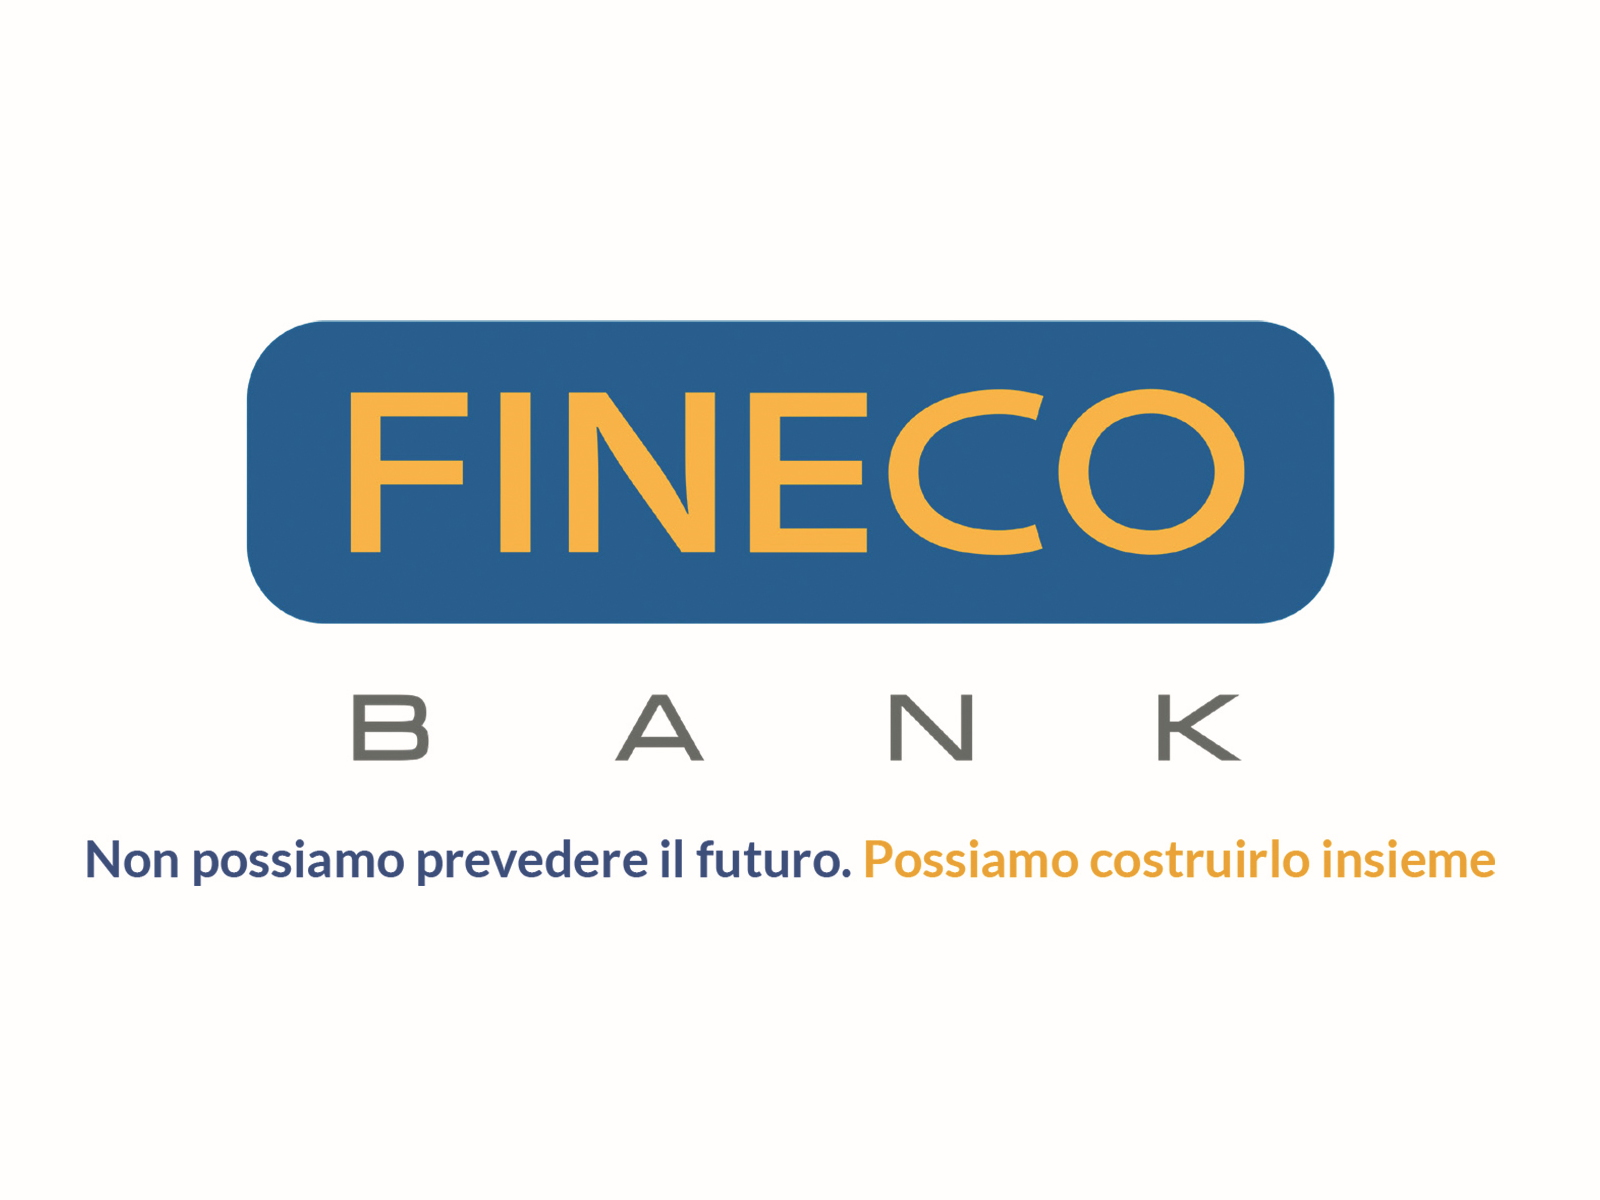 fineco-bank